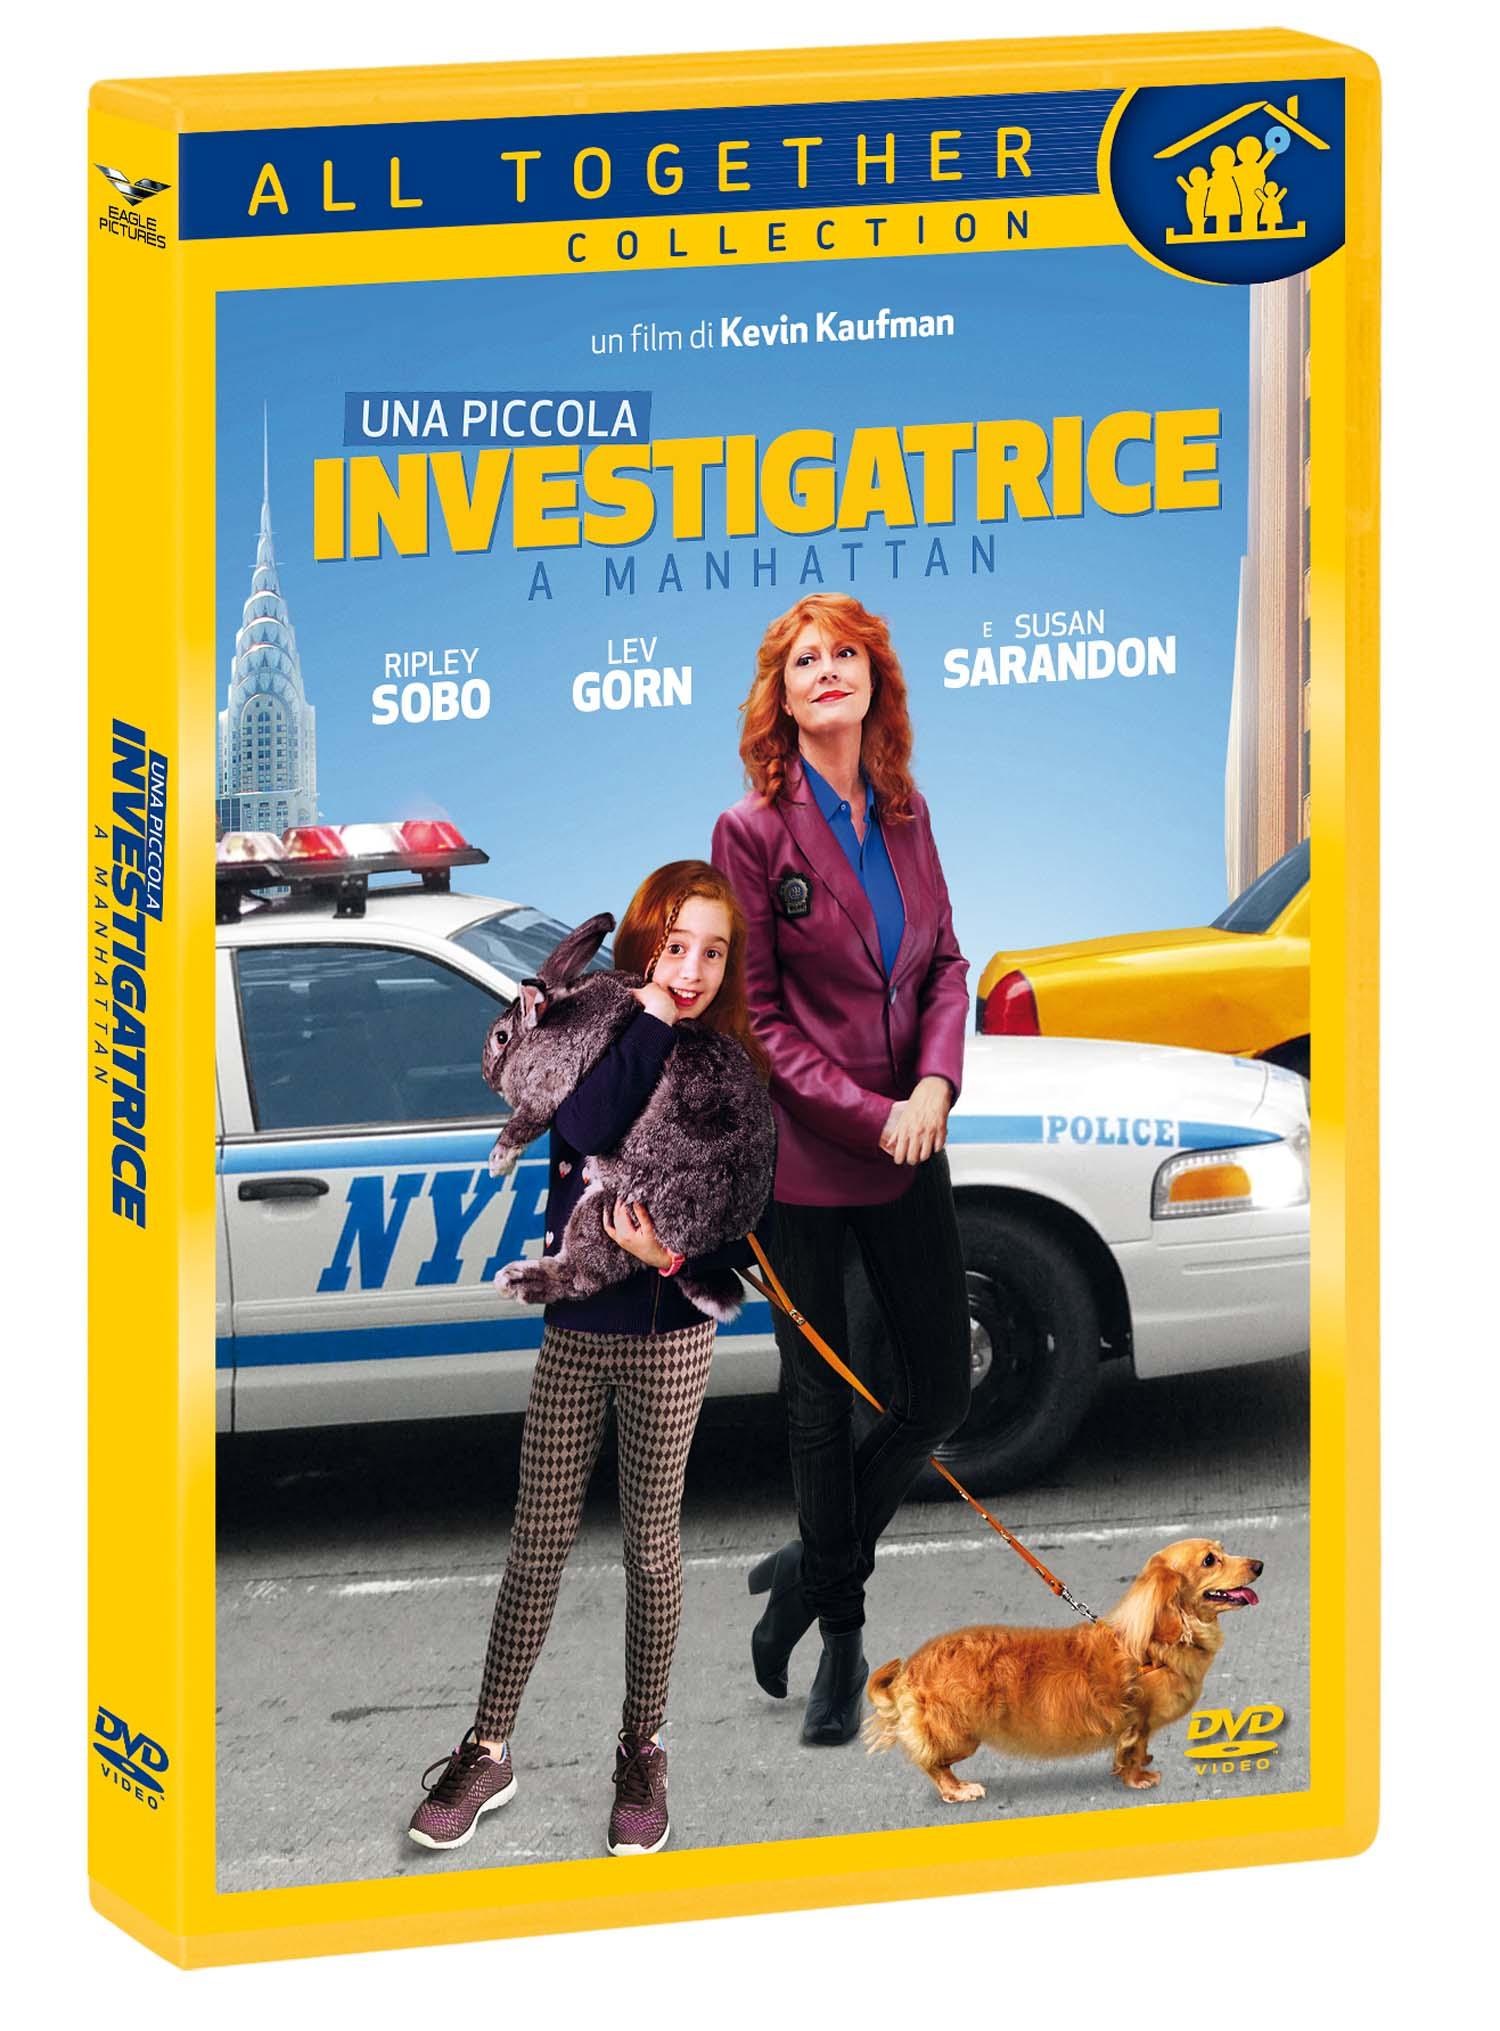 UNA PICCOLA INVESTIGATRICE A MANHATTAN (DVD)